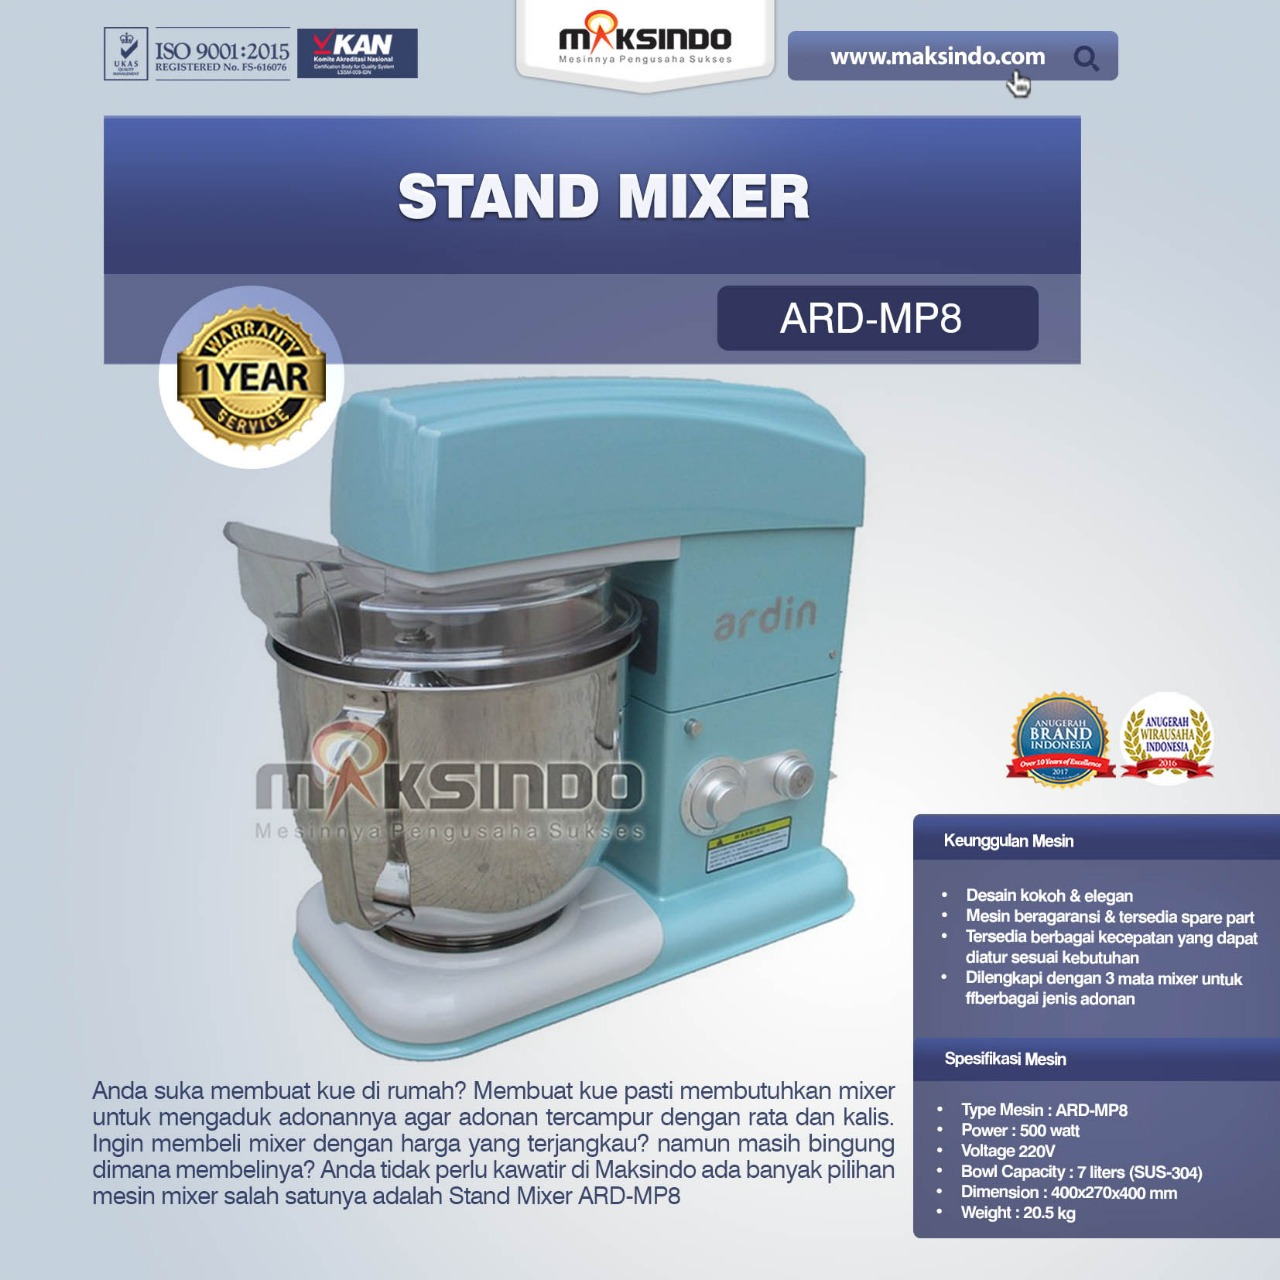 Jual Stand Mixer ARD-MP8 di Medan